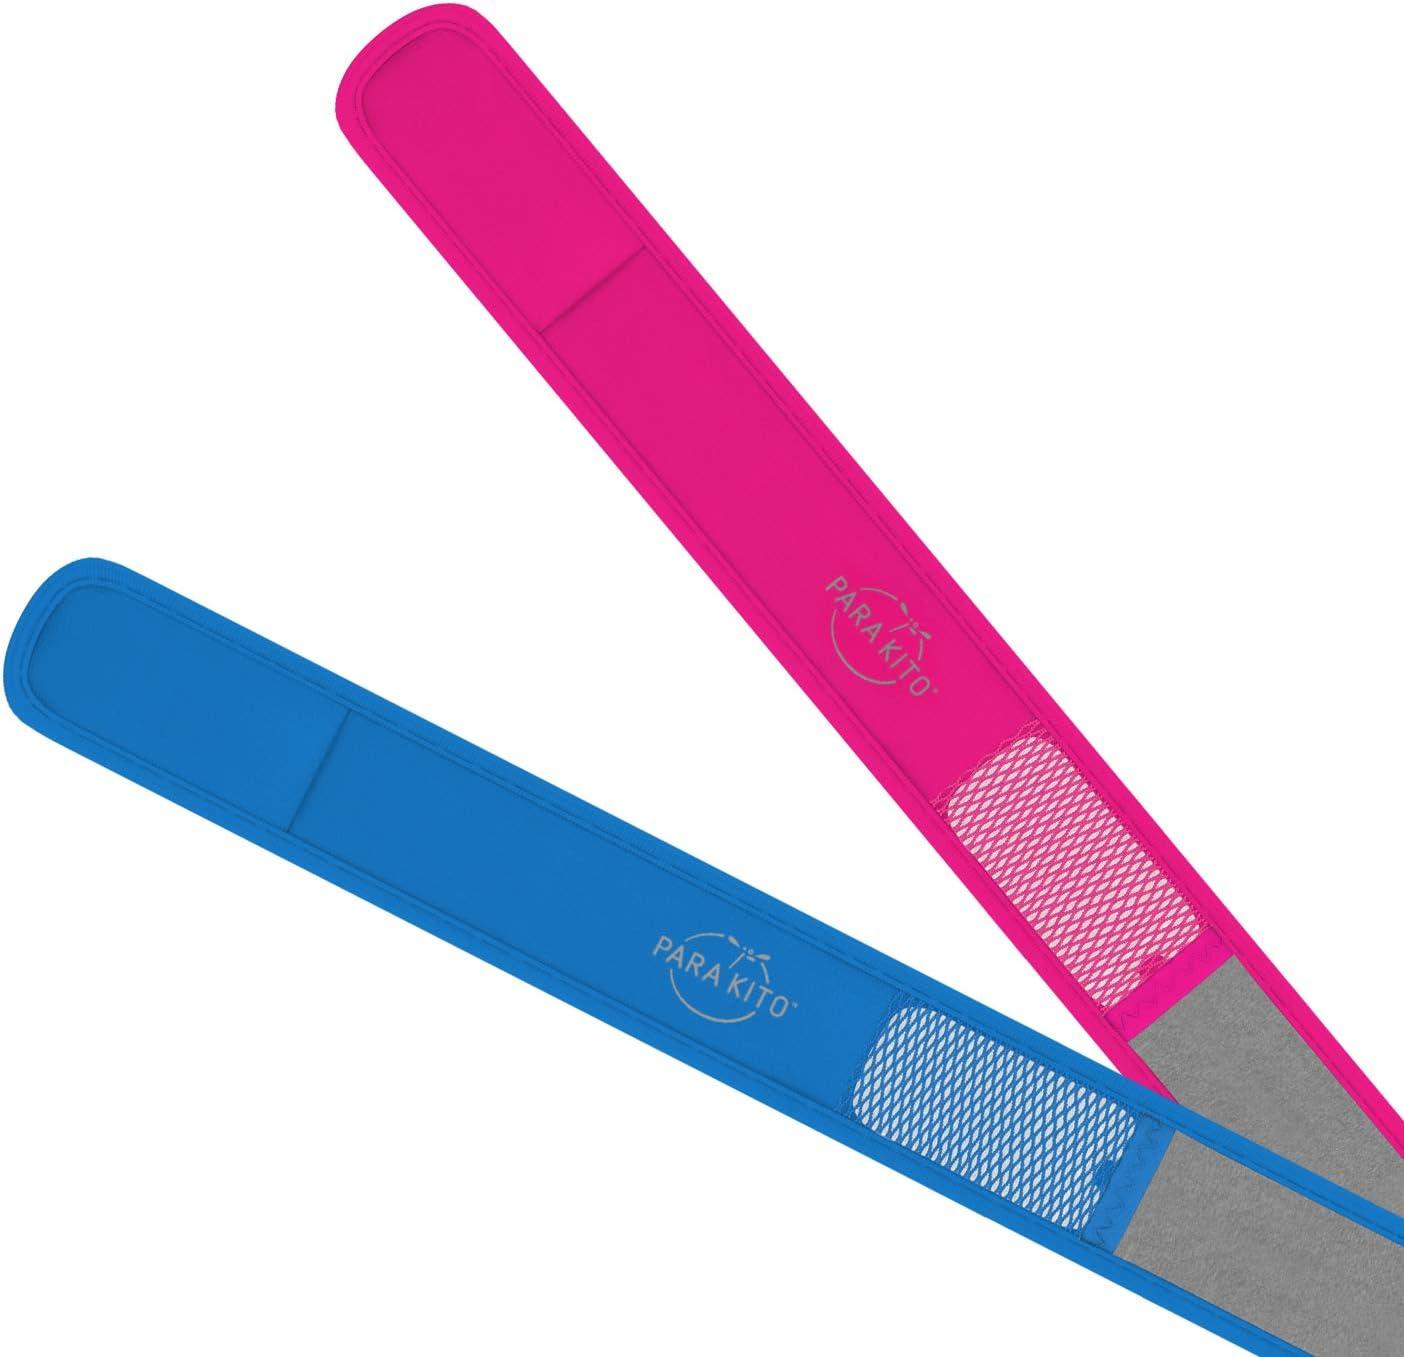 2 Wristbands ParaKito Mosquito Repellent Bonus Pack Yellow + Deep Blue 2 Refills